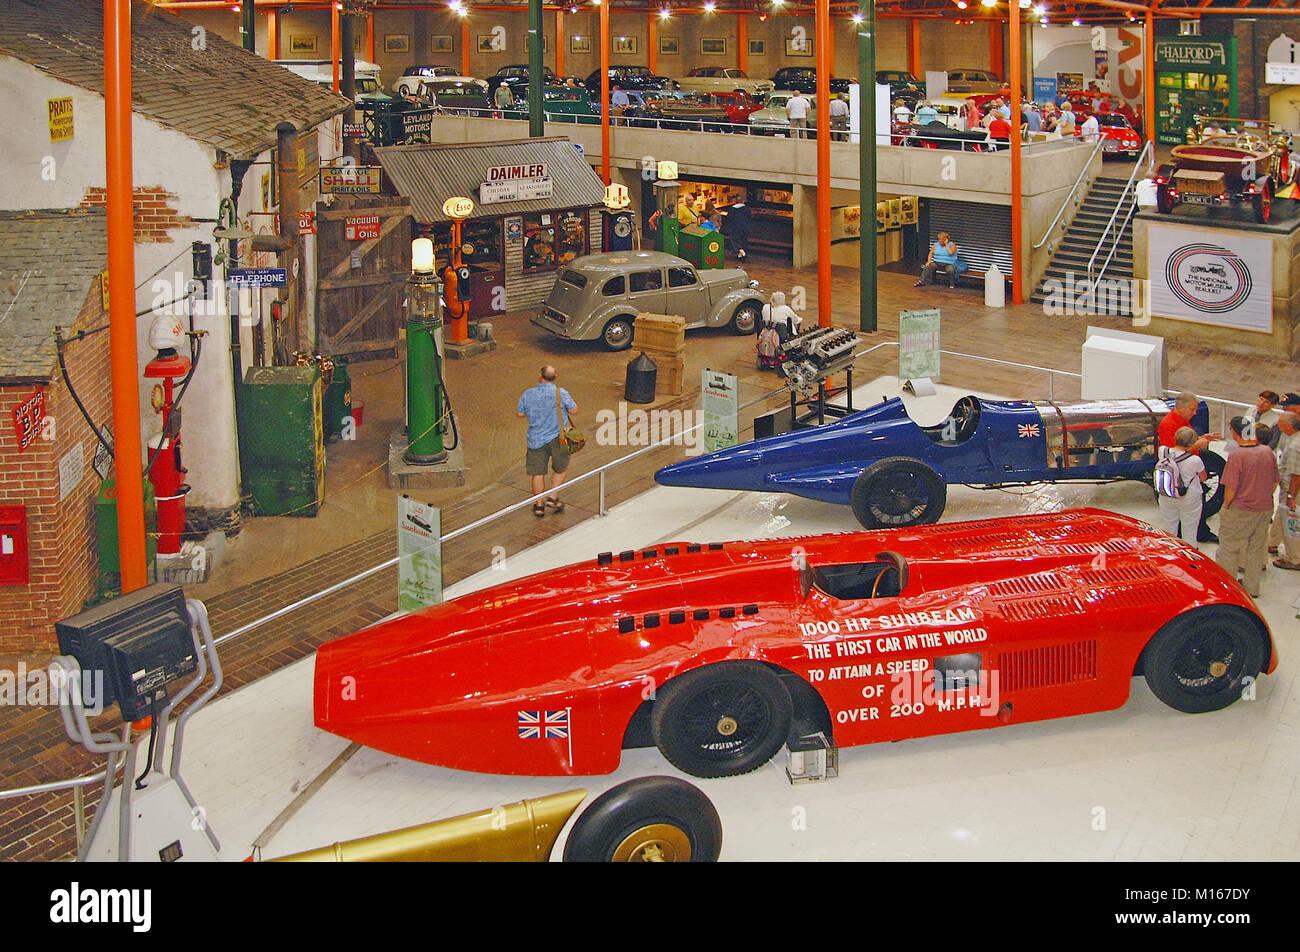 Innerhalb der National Motor Museum in Beaulieu, New Forest, Hampshire, England, Großbritannien, Großbritannien Stockbild